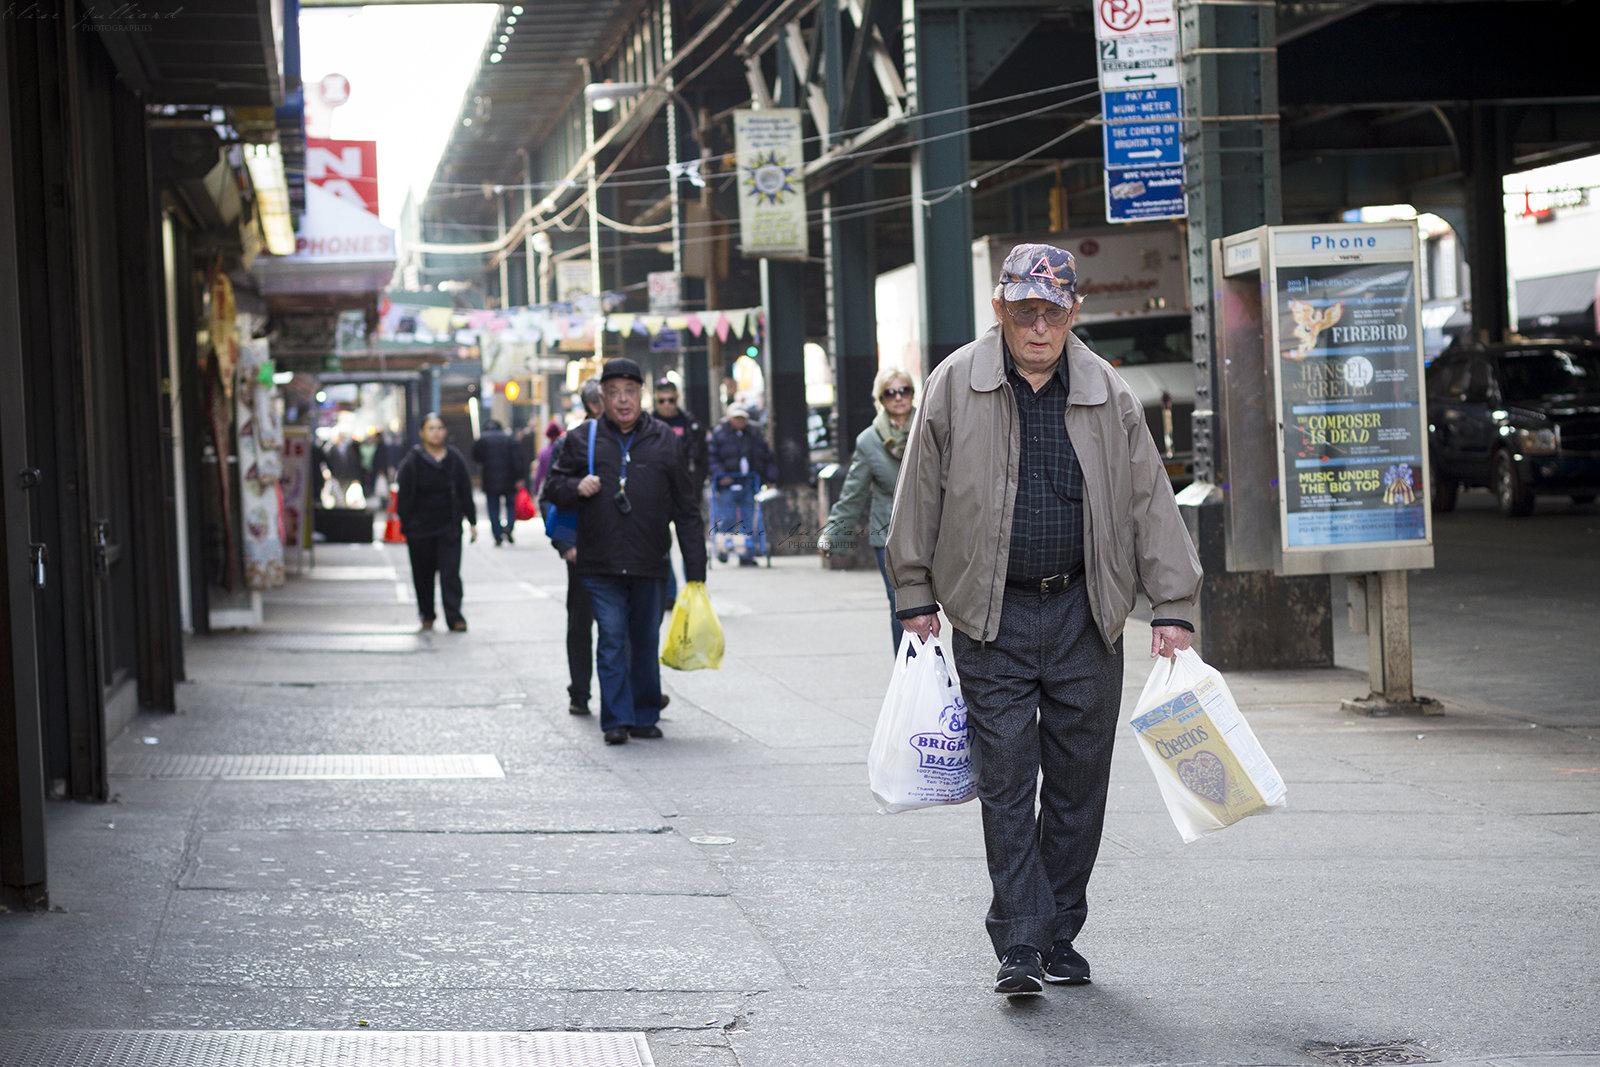 elise-julliard-photographe-new-york-etats-unis-usa-portrait-de-rue-8